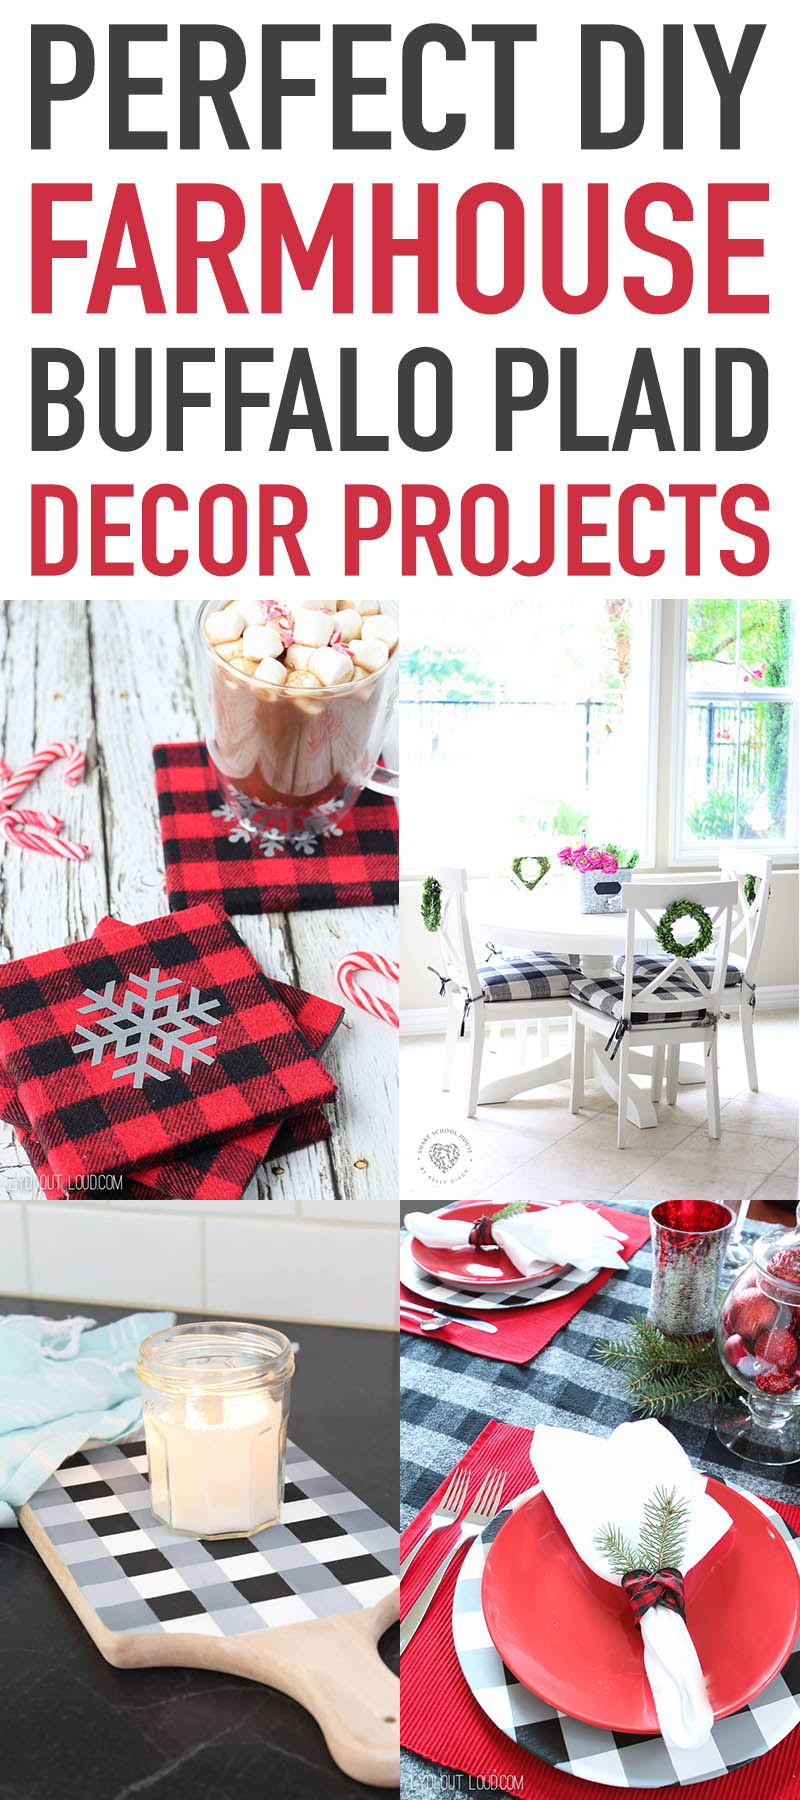 decor and craft ideas using plaid and buffalo check design